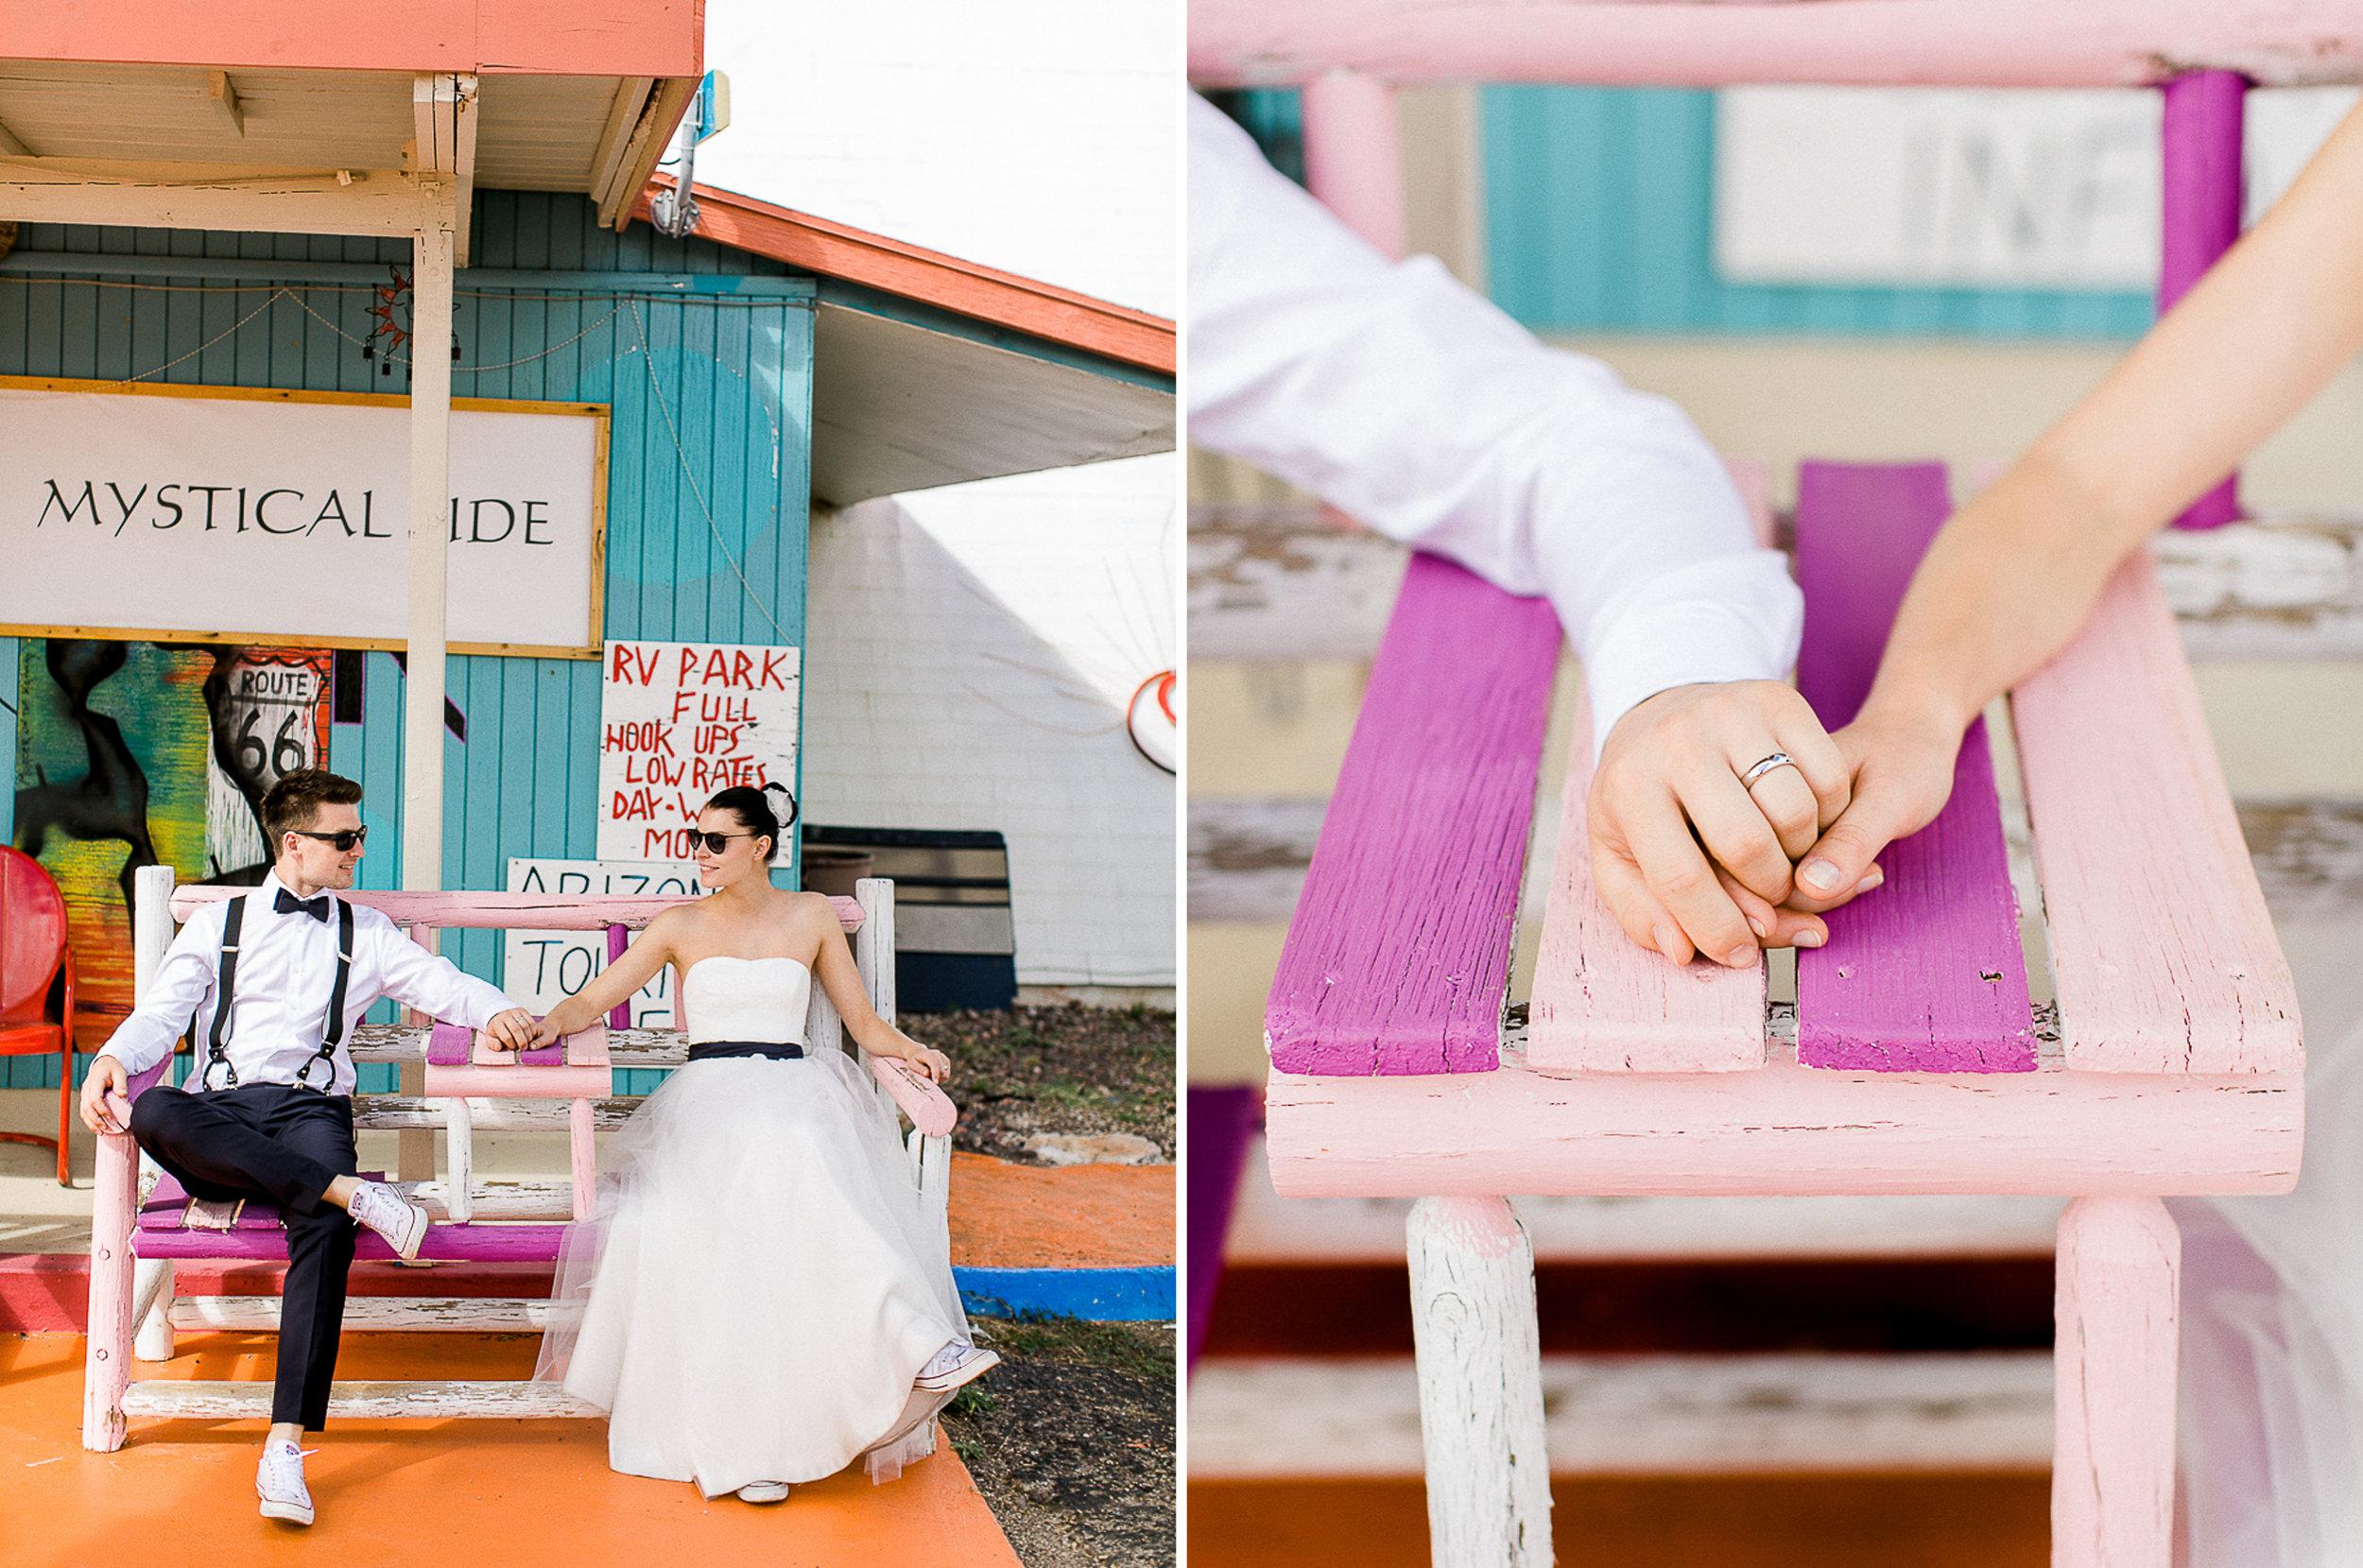 Susi-und-Danu-Hochzeit-Theresa-Pewal-Fotografie-fine-art-7-1.jpg